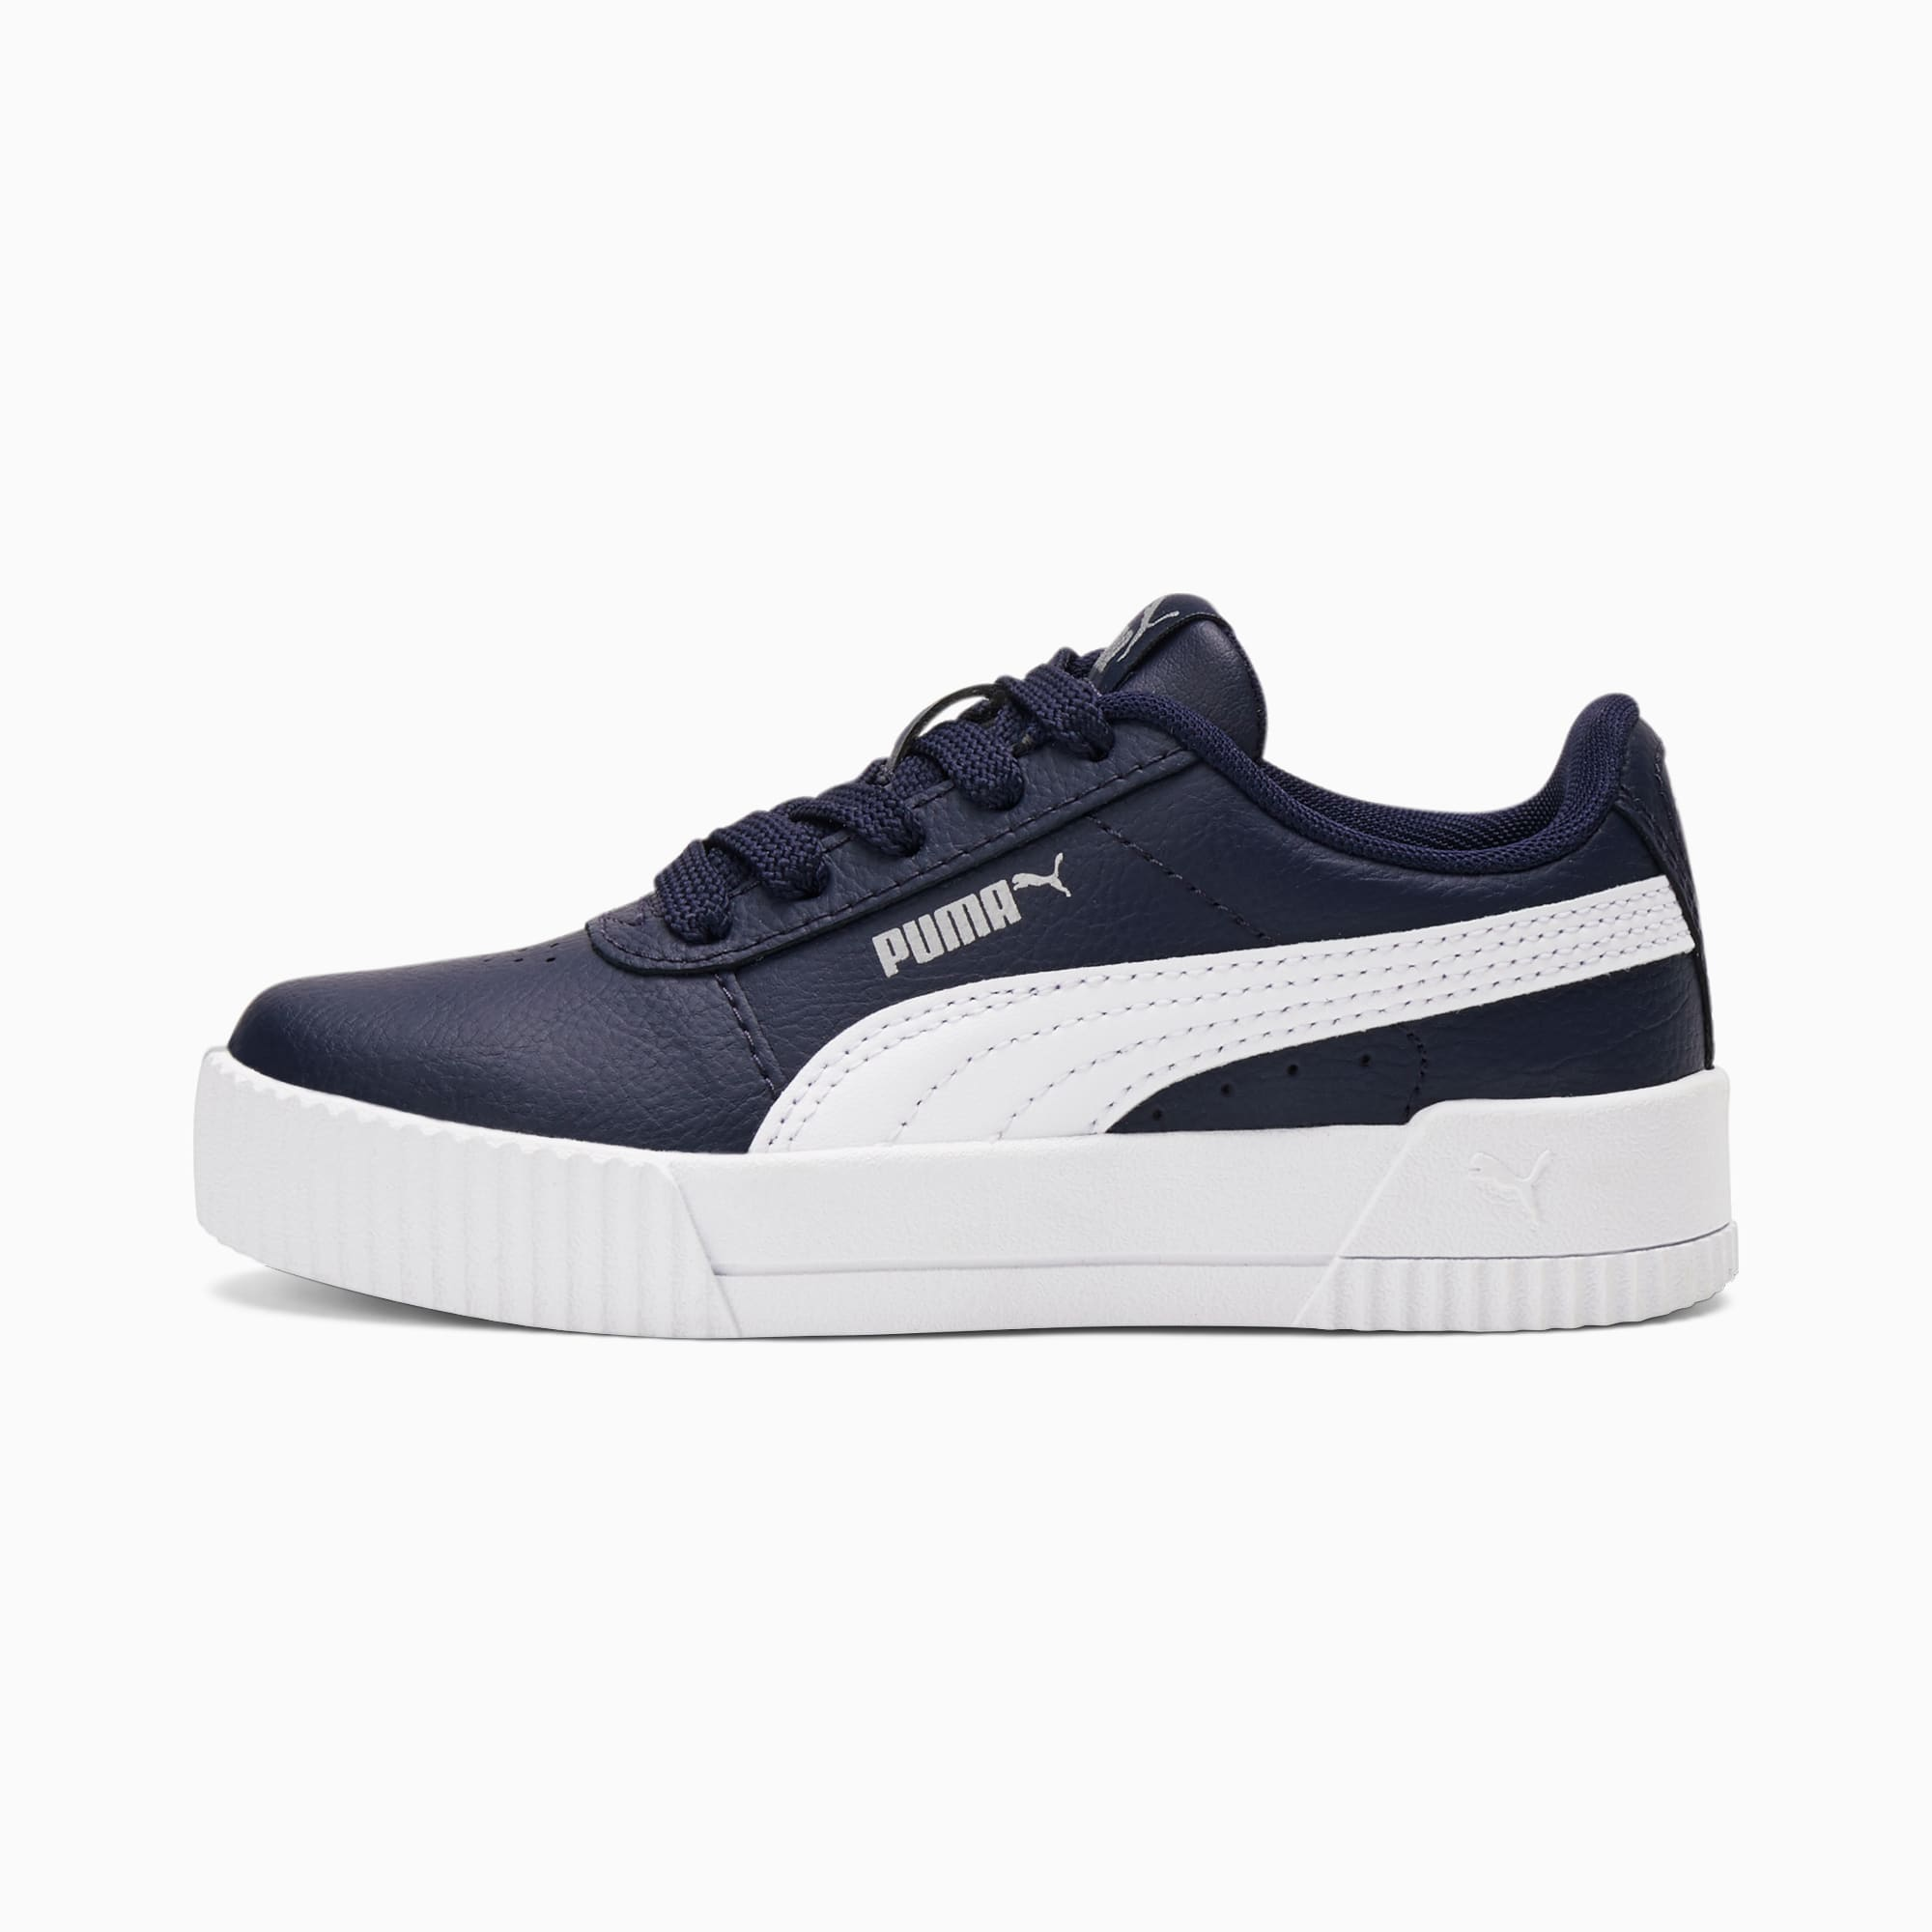 PUMA Carina L Kids Mädchen Sneaker Schuhe   Mit Aucun   Blau/Weiß   Größe: 32.5